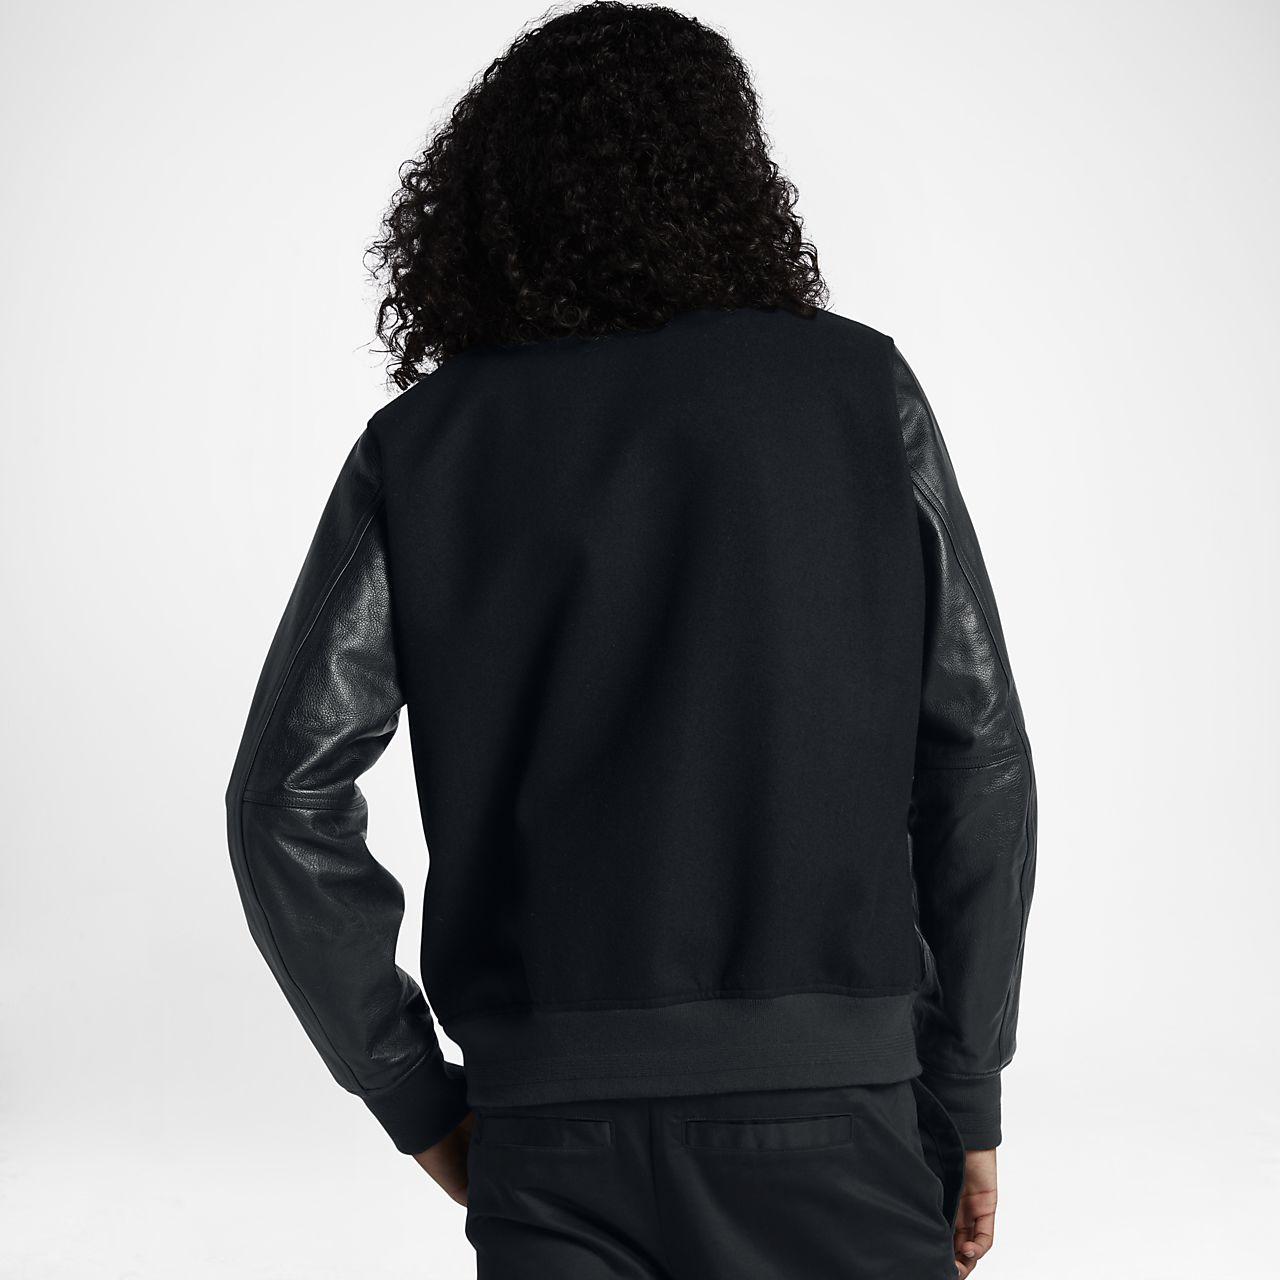 good factory authentic authorized site Veste NikeLab Collection Destroyer pour Homme